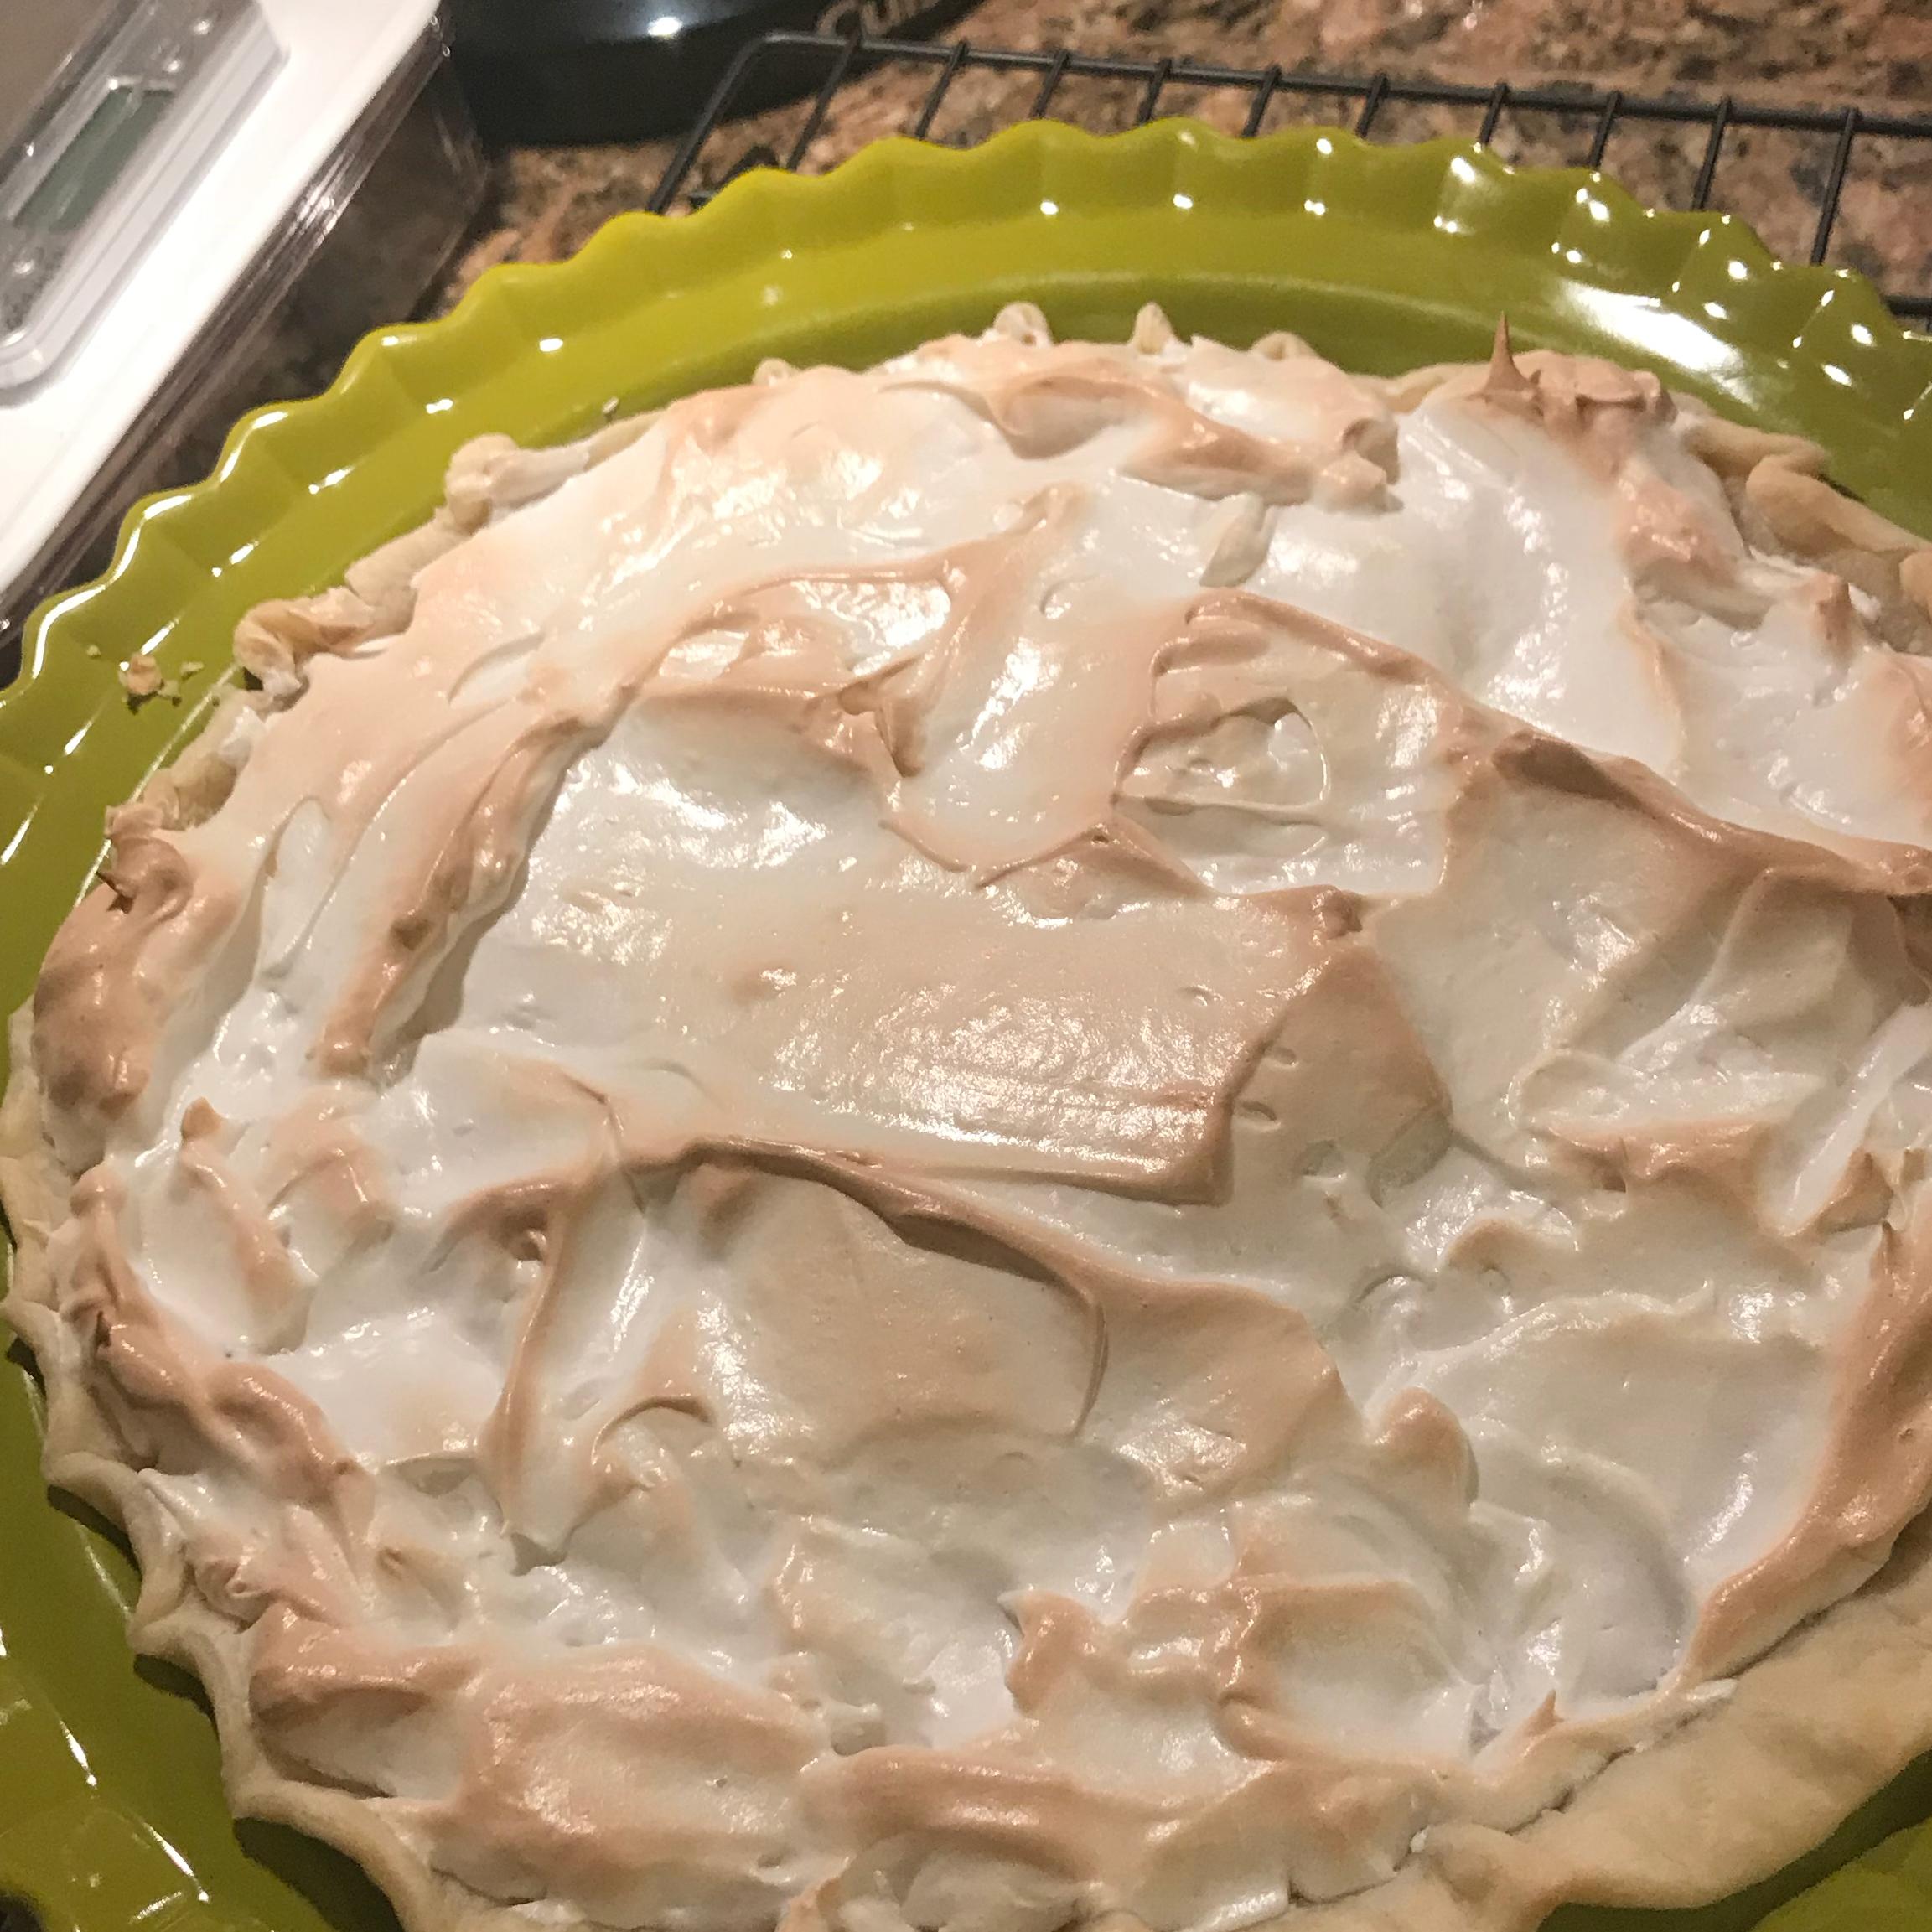 Orange Meringue Pie without Condensed Milk JJOHN32